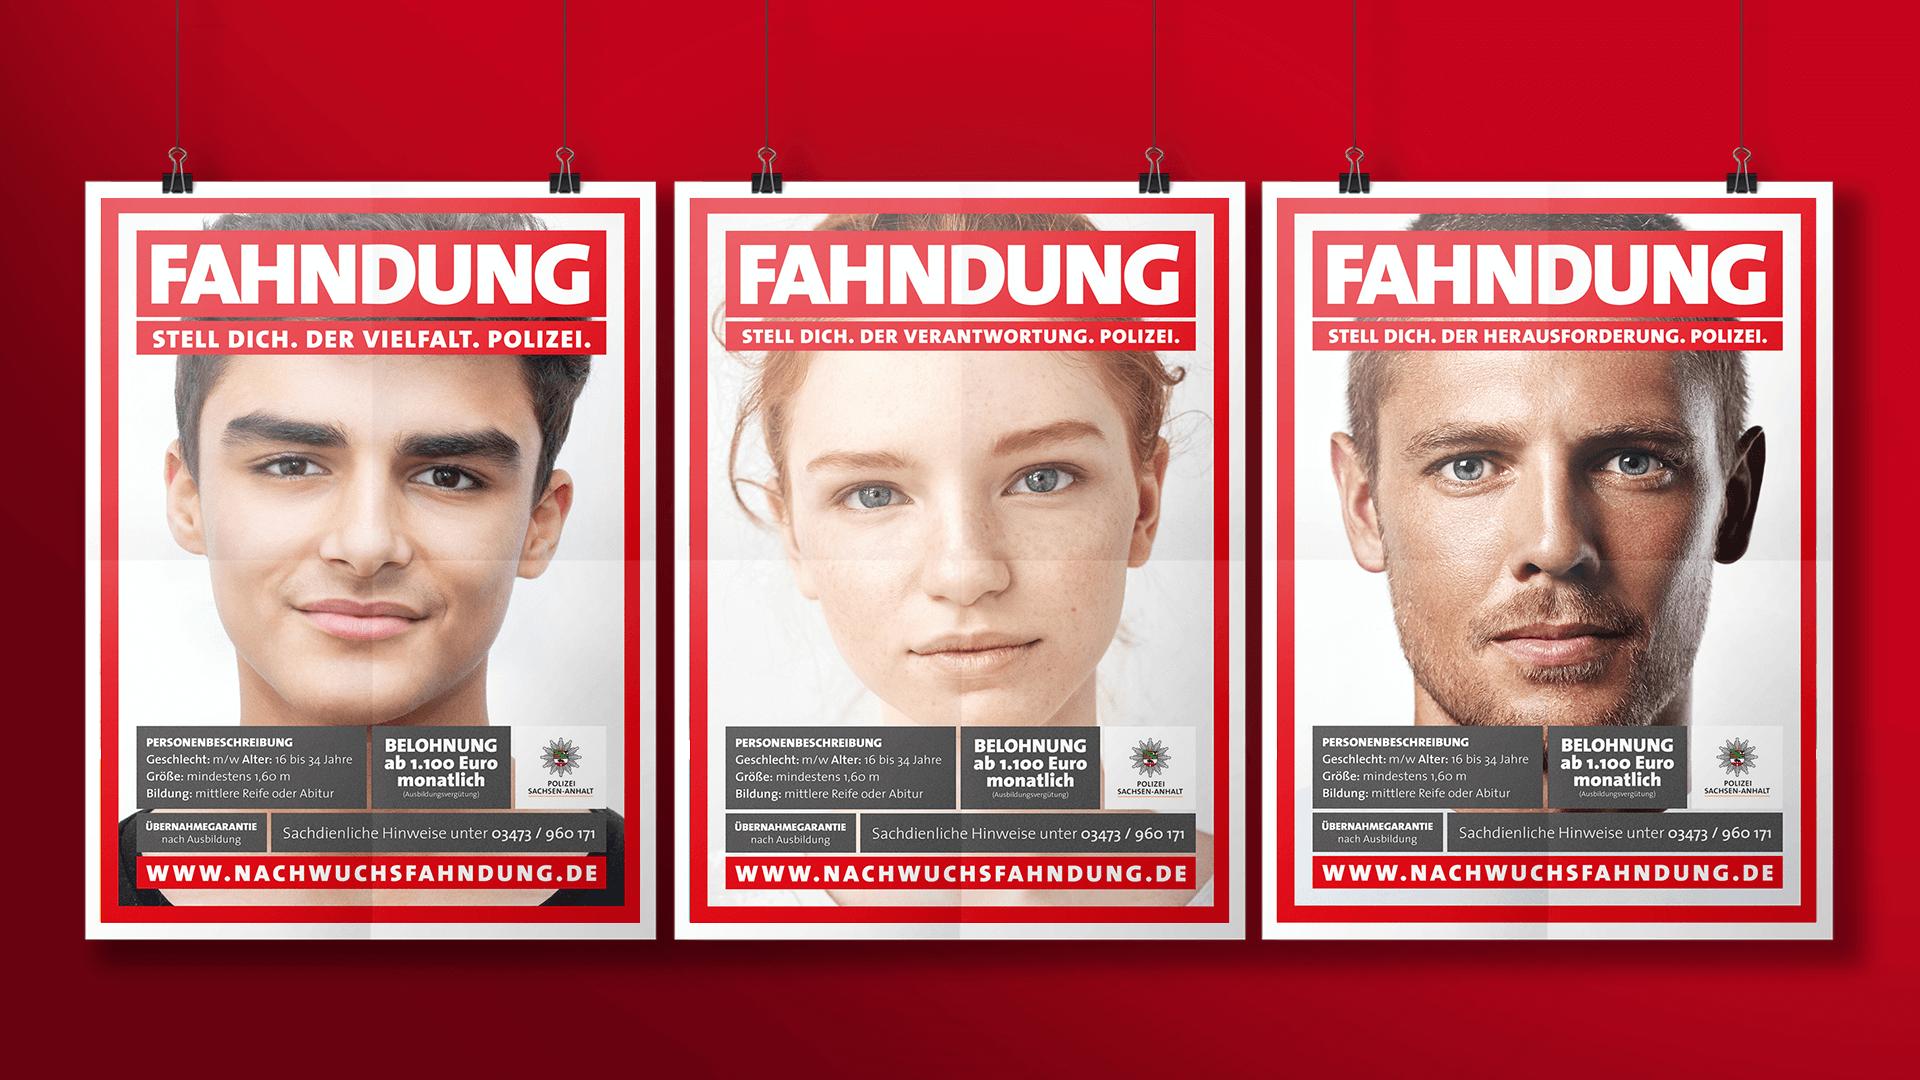 werbefilm agentur berlin werbeagentur branding kampagne corporate design